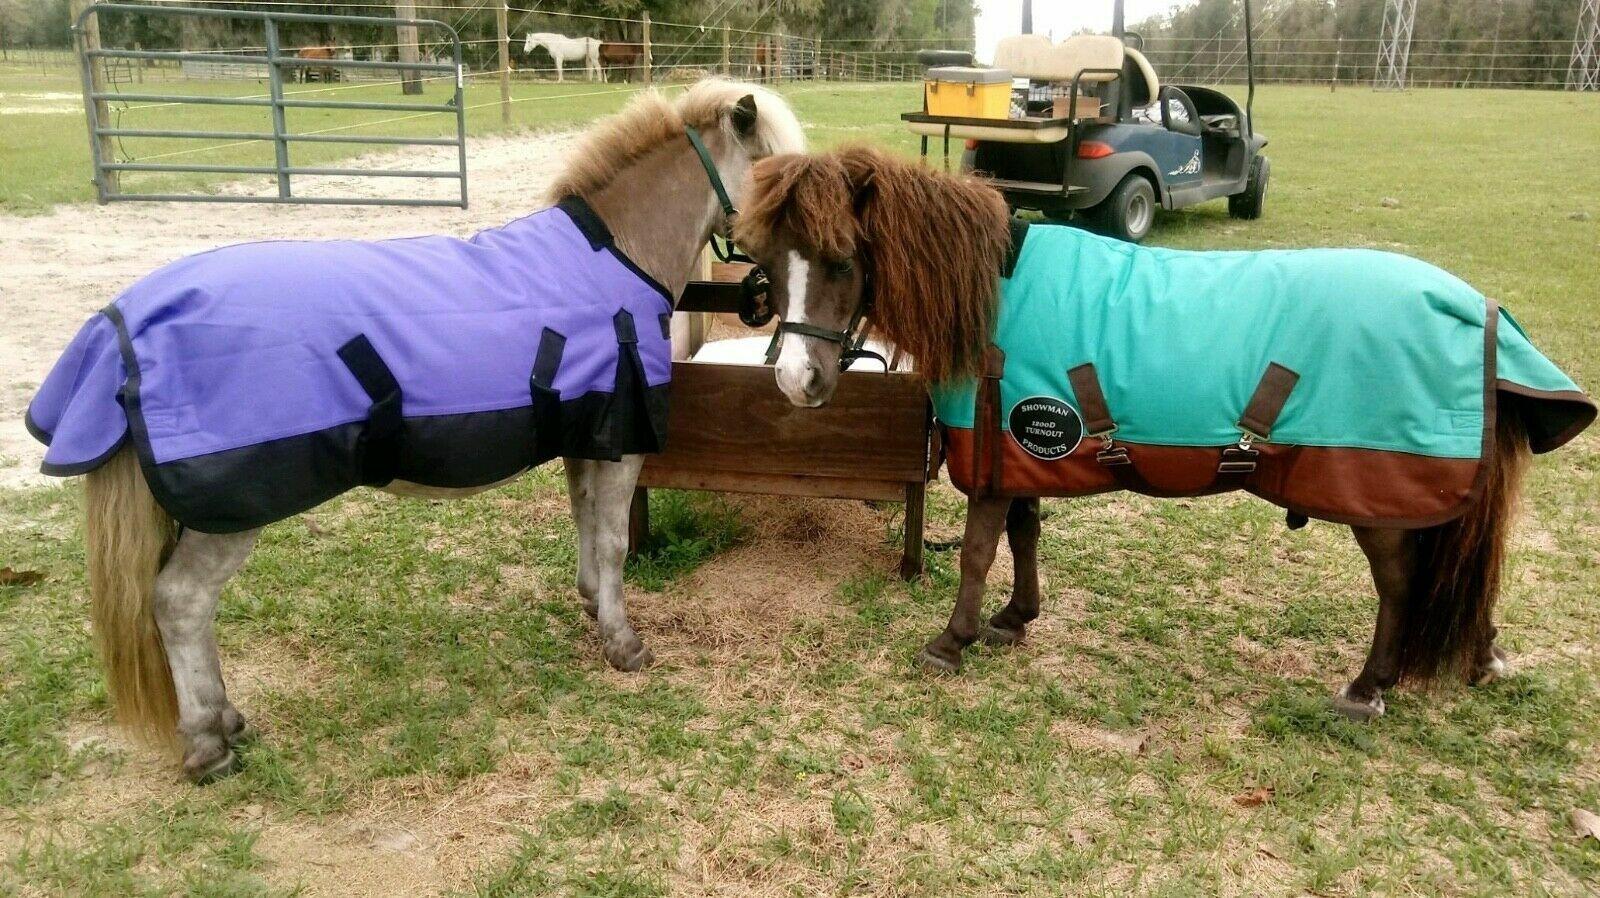 56 60 62 Winter WATERPROOF Turnout BLANKET Pony Smtutti cavallo blu viola TEAL